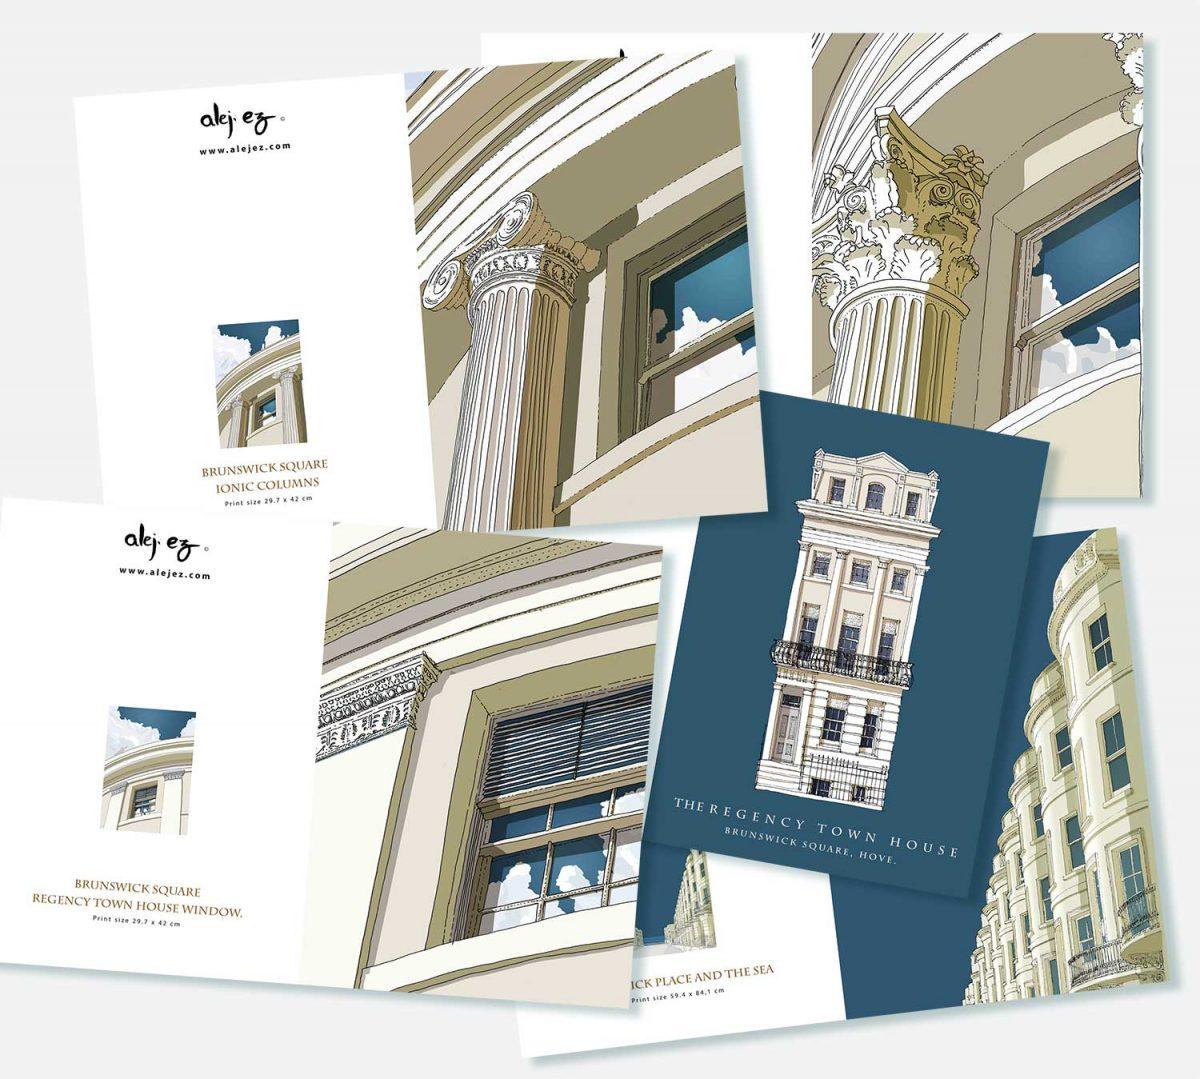 Set depicting Brunswick Square Hove by artist alej ez